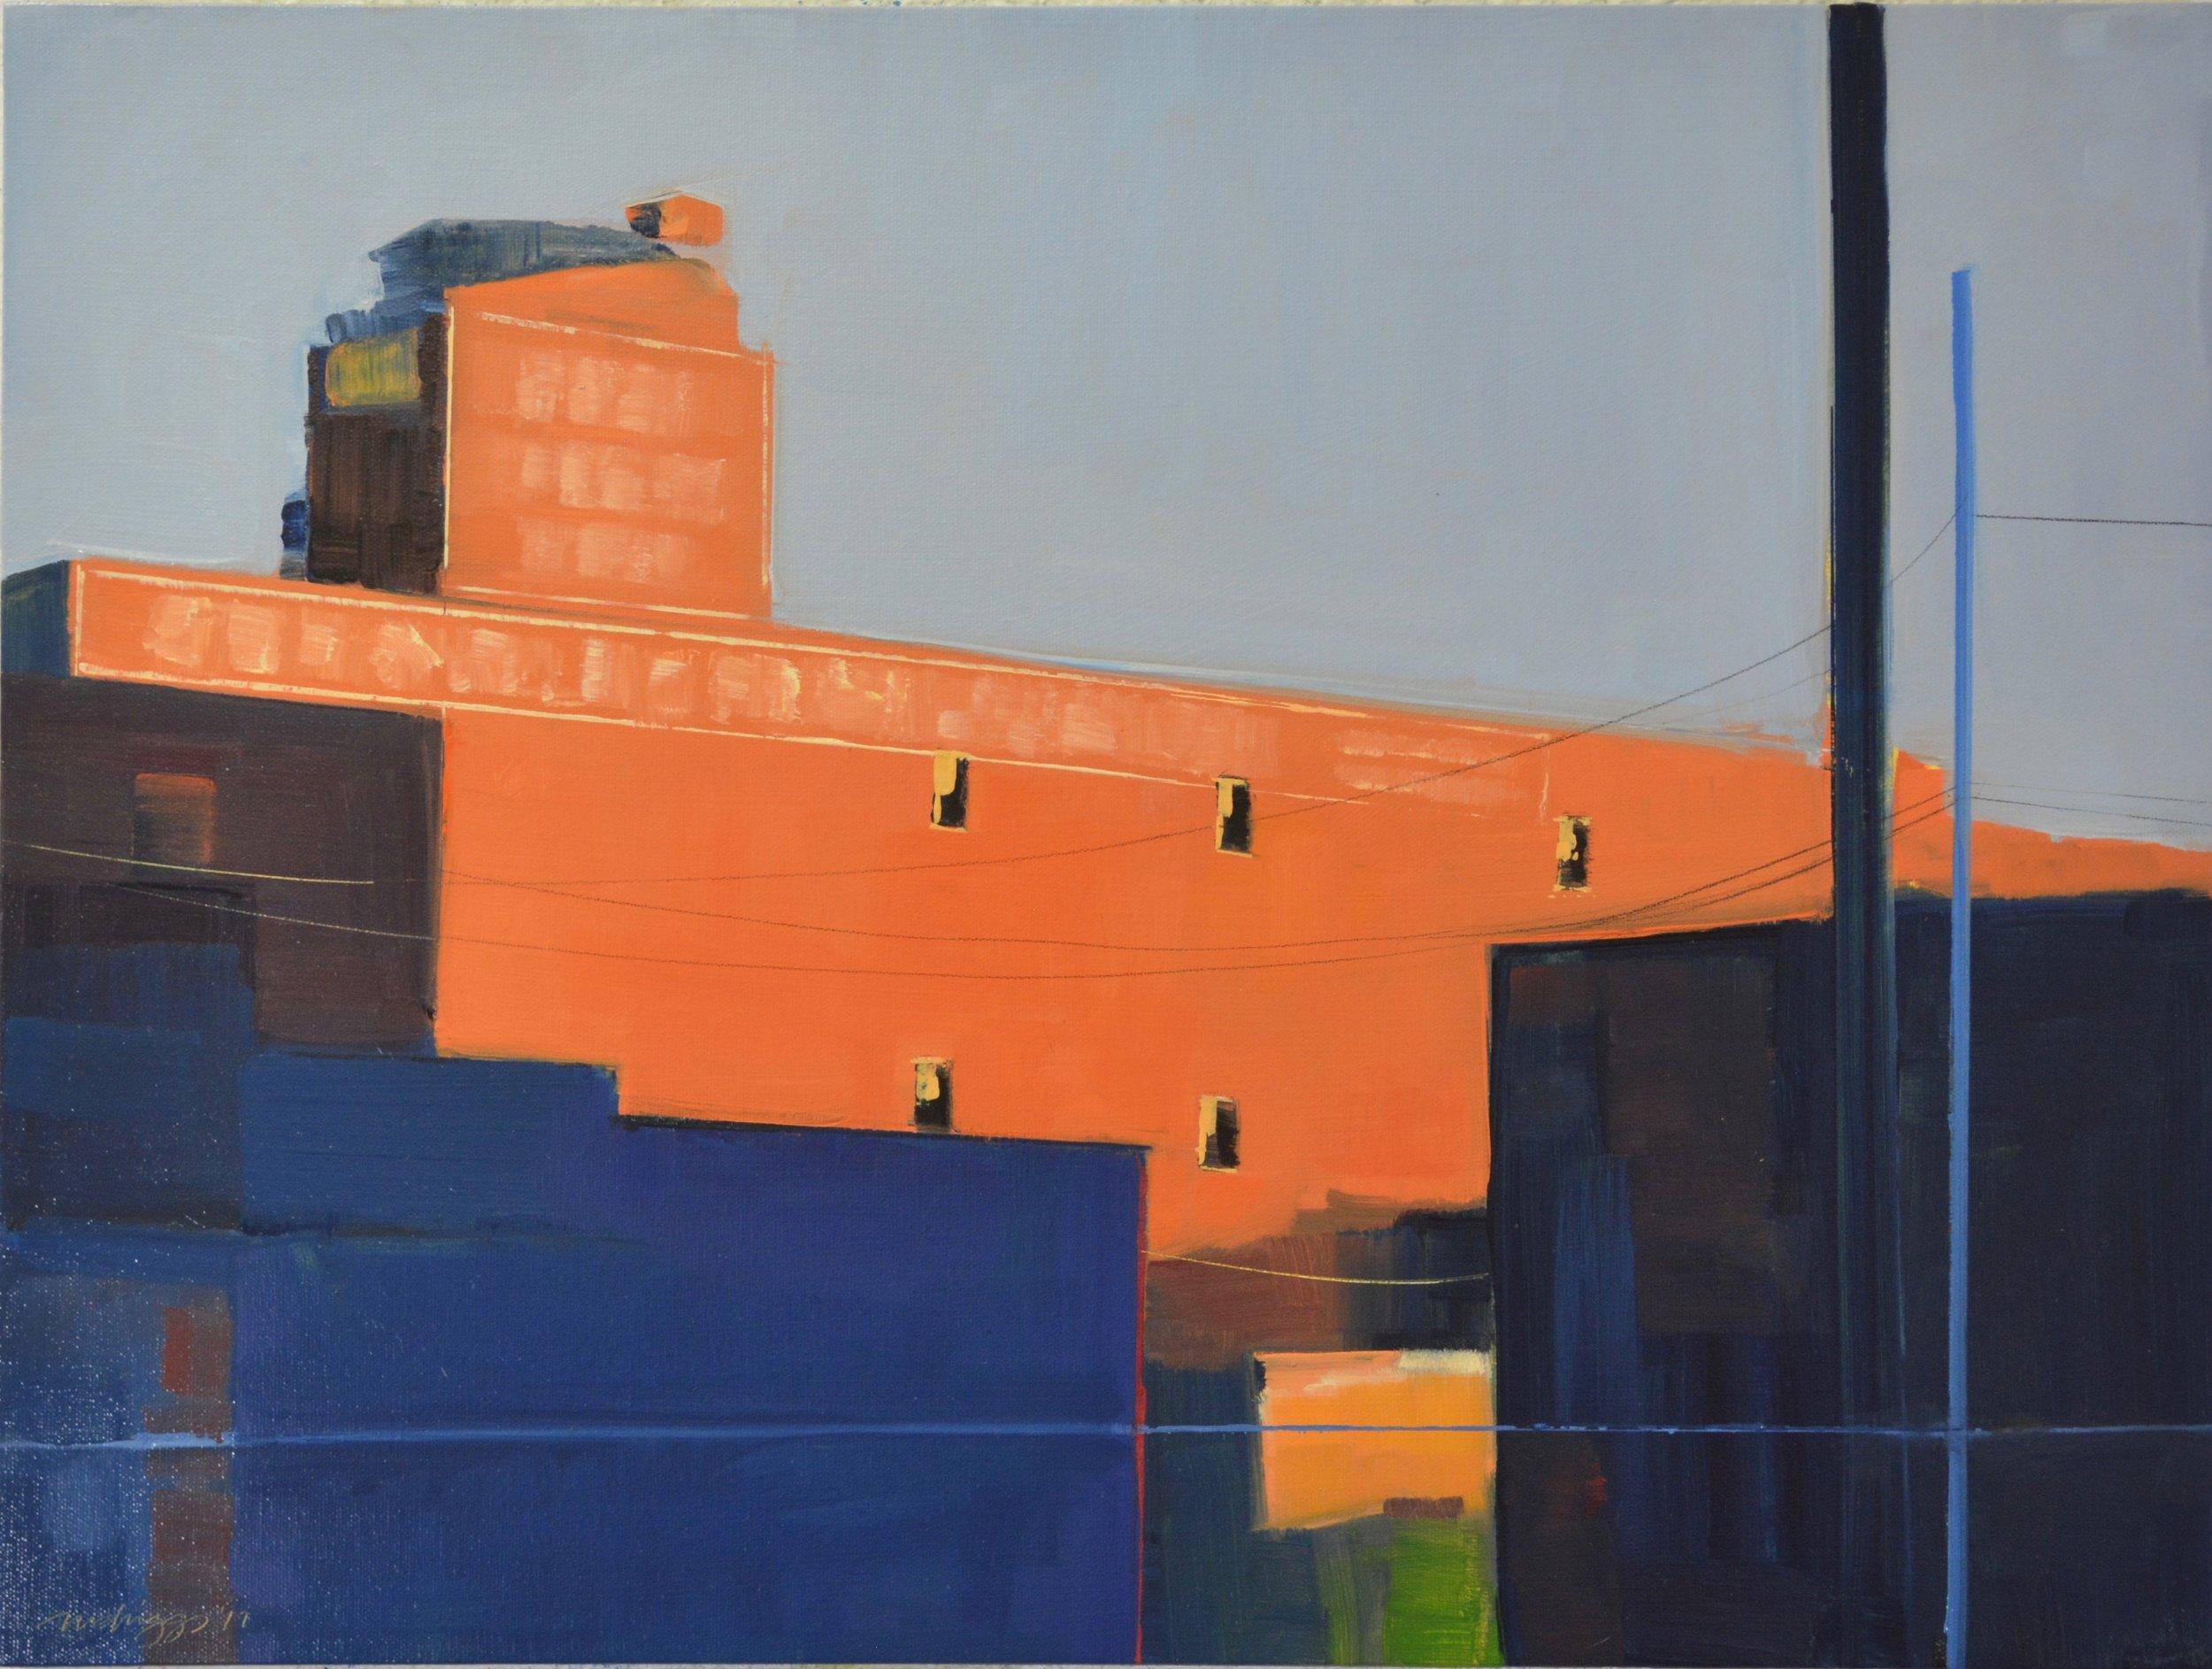 Building Blocks by Michael Driggs